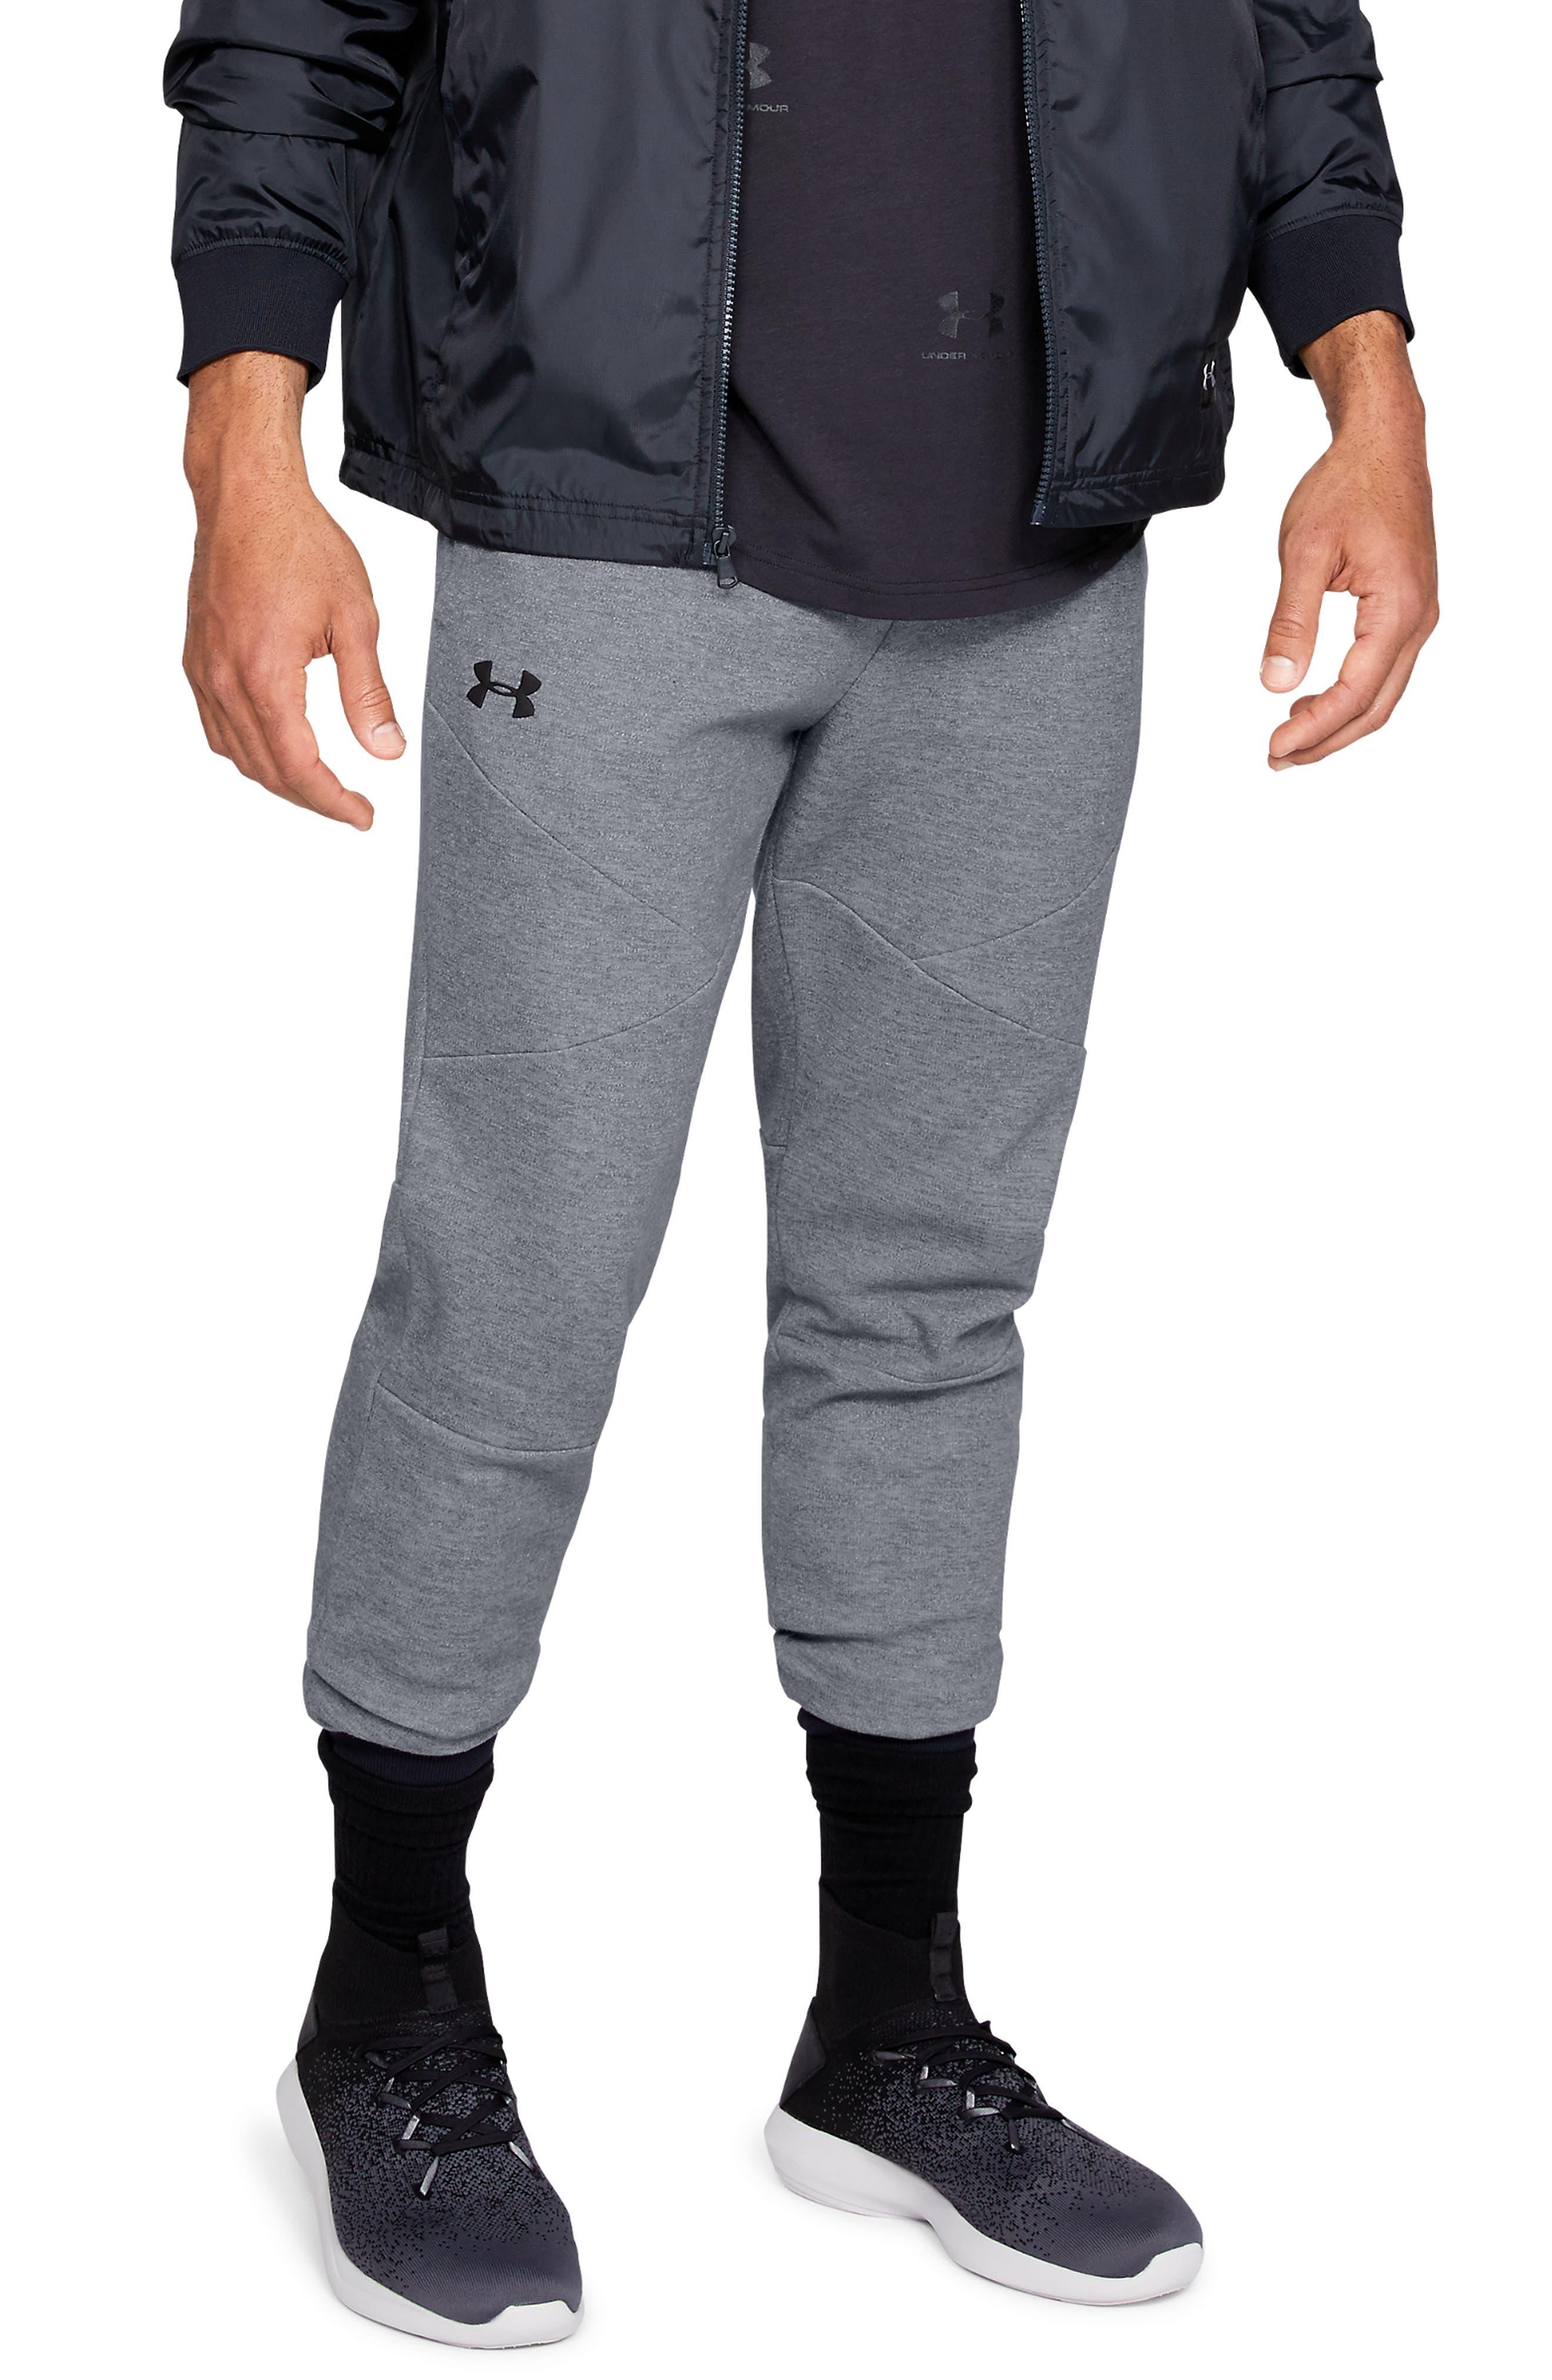 Unstoppable Double Knit Jogger Pants,                             Main thumbnail 1, color,                             STEEL